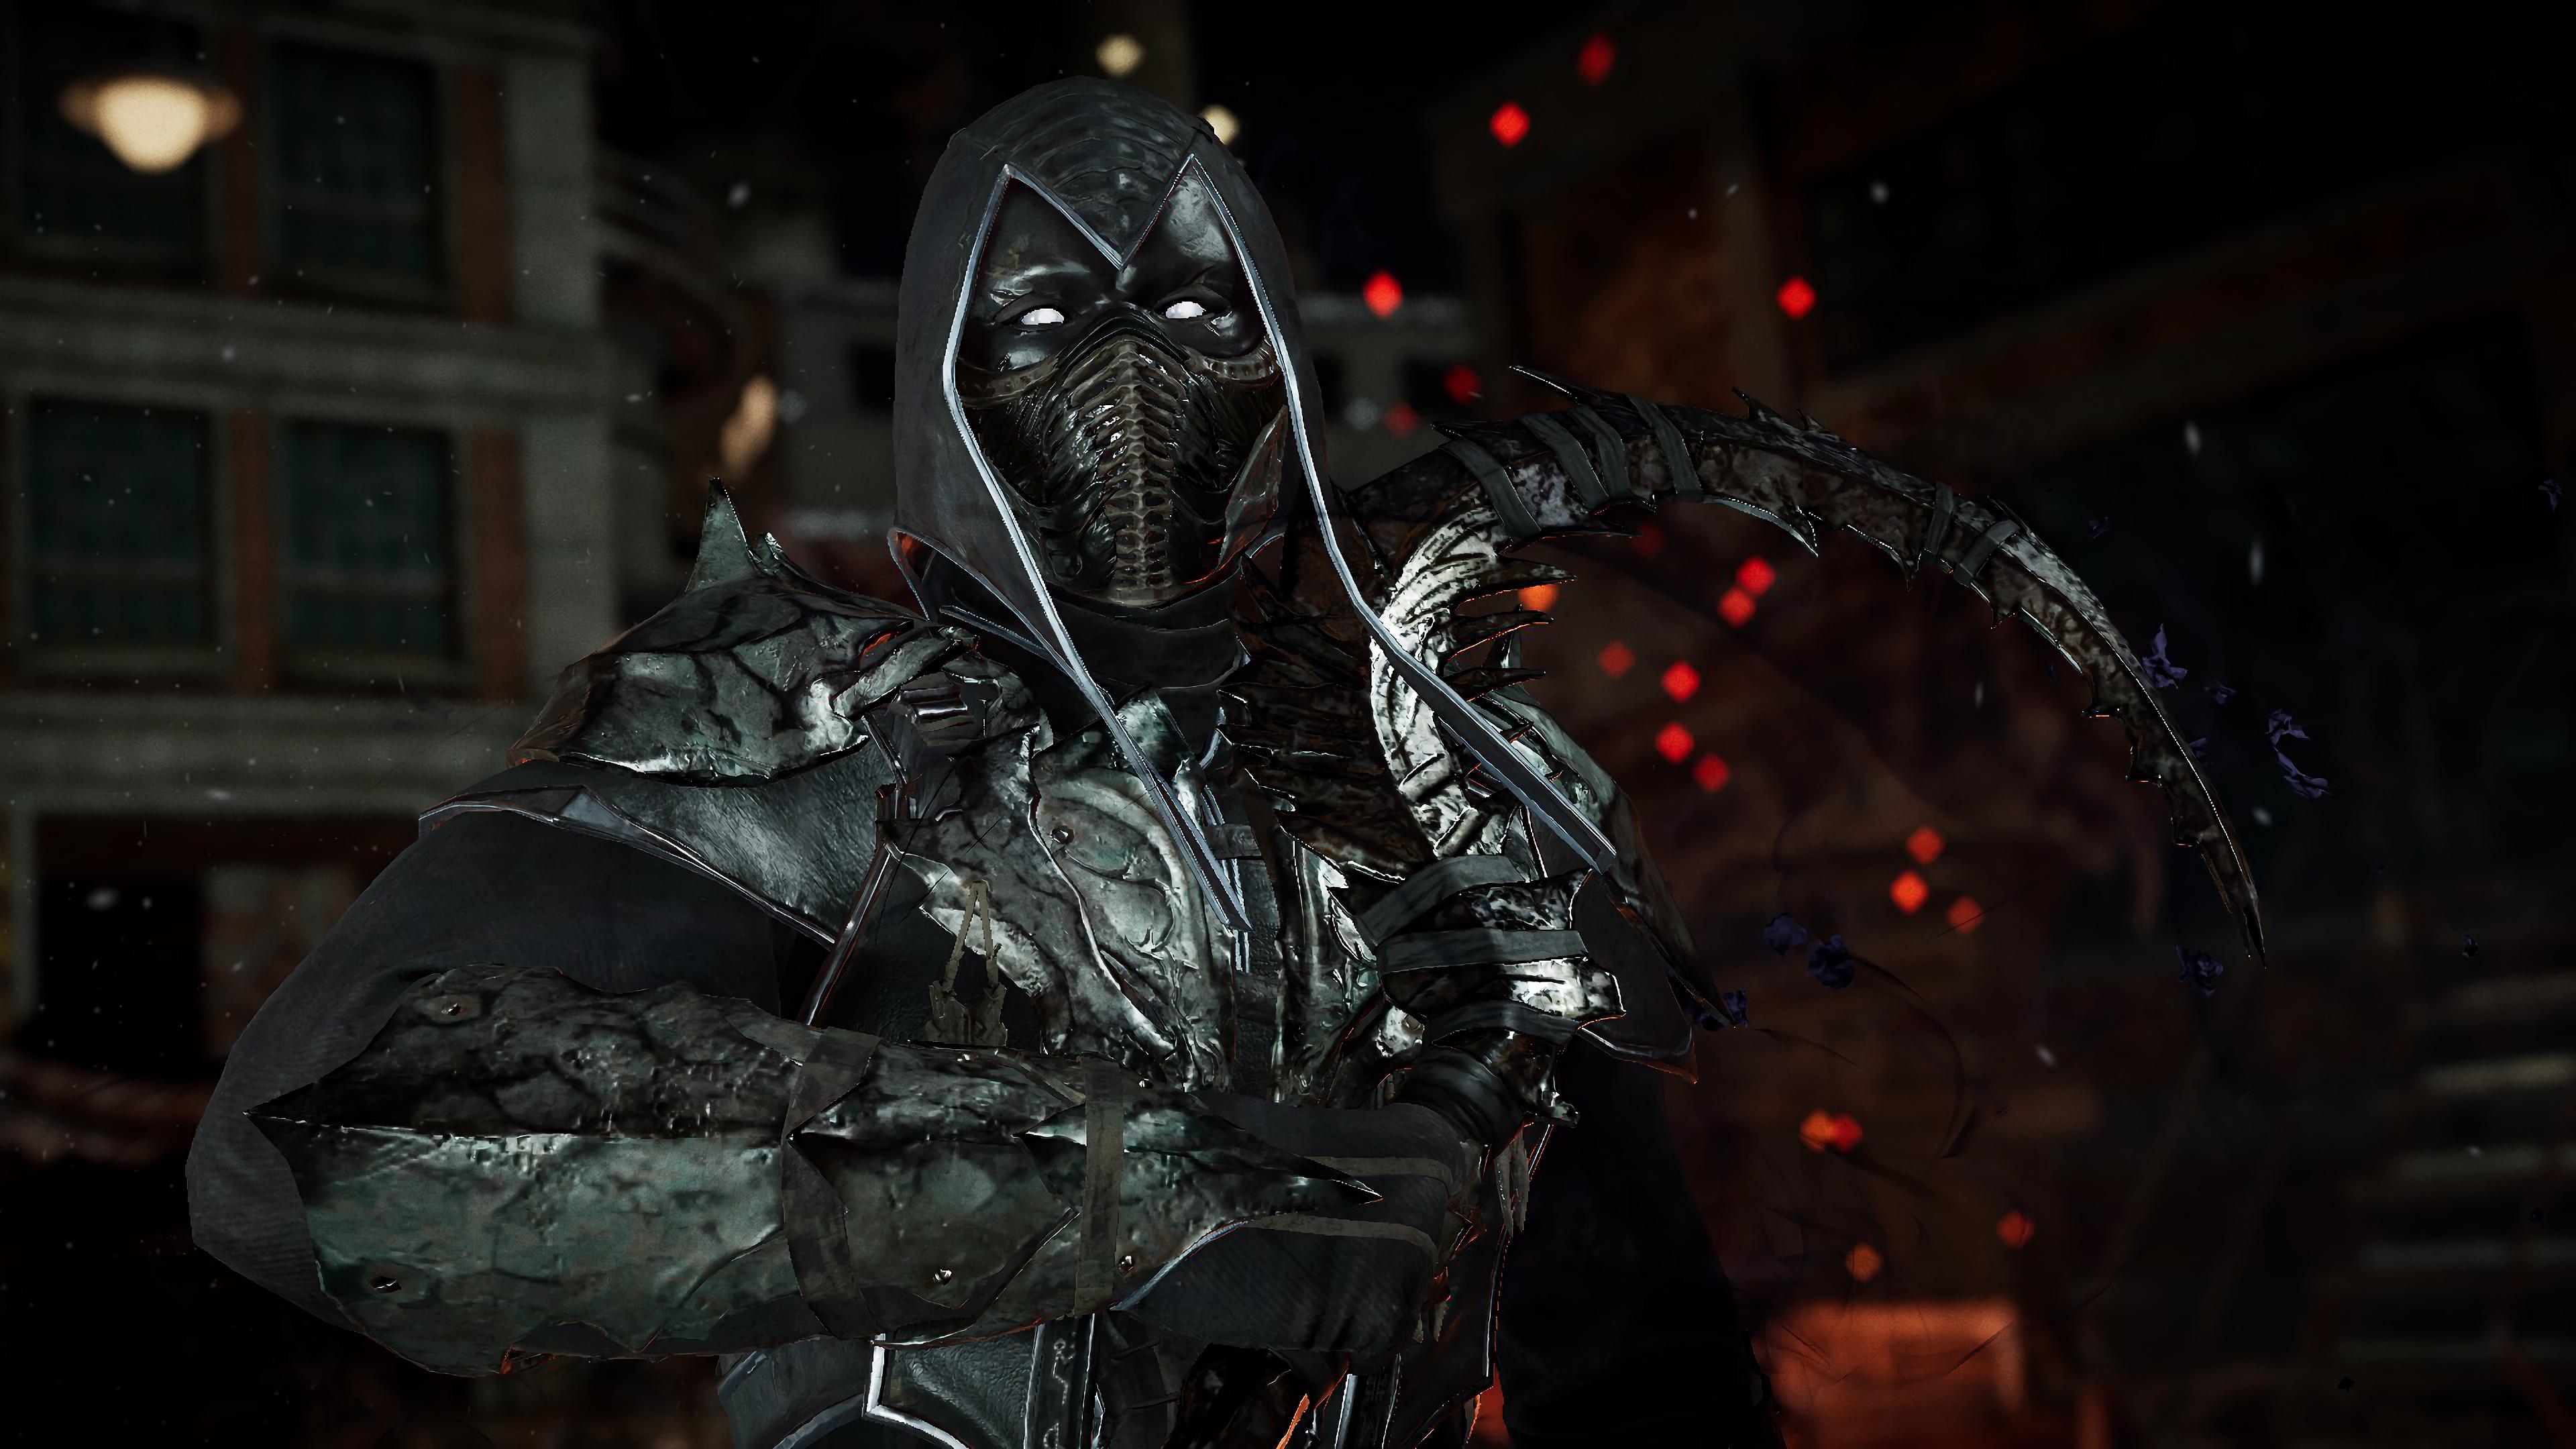 4k Mortal Kombat 11 Noob Saibot 2165359 Hd Wallpaper